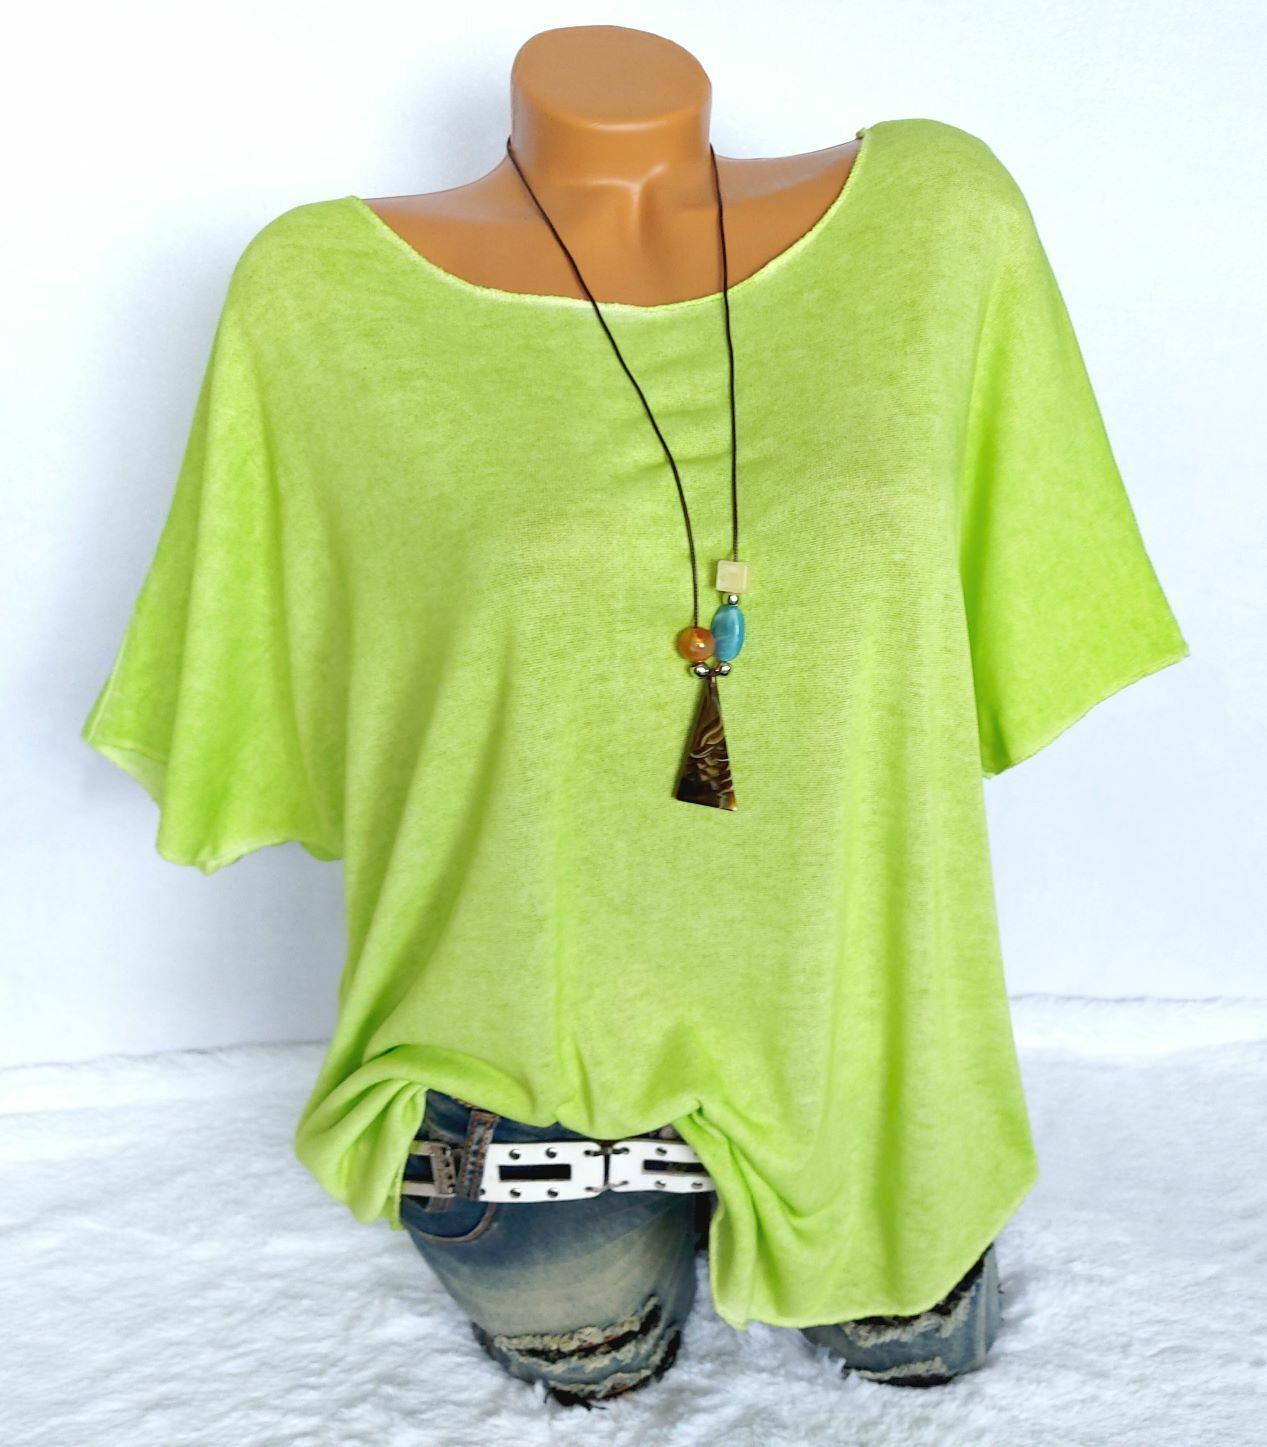 Damen Shirt mit Kette Oversize Italy T-Shirt Bluse Tunika Grüngelb 40 42 44